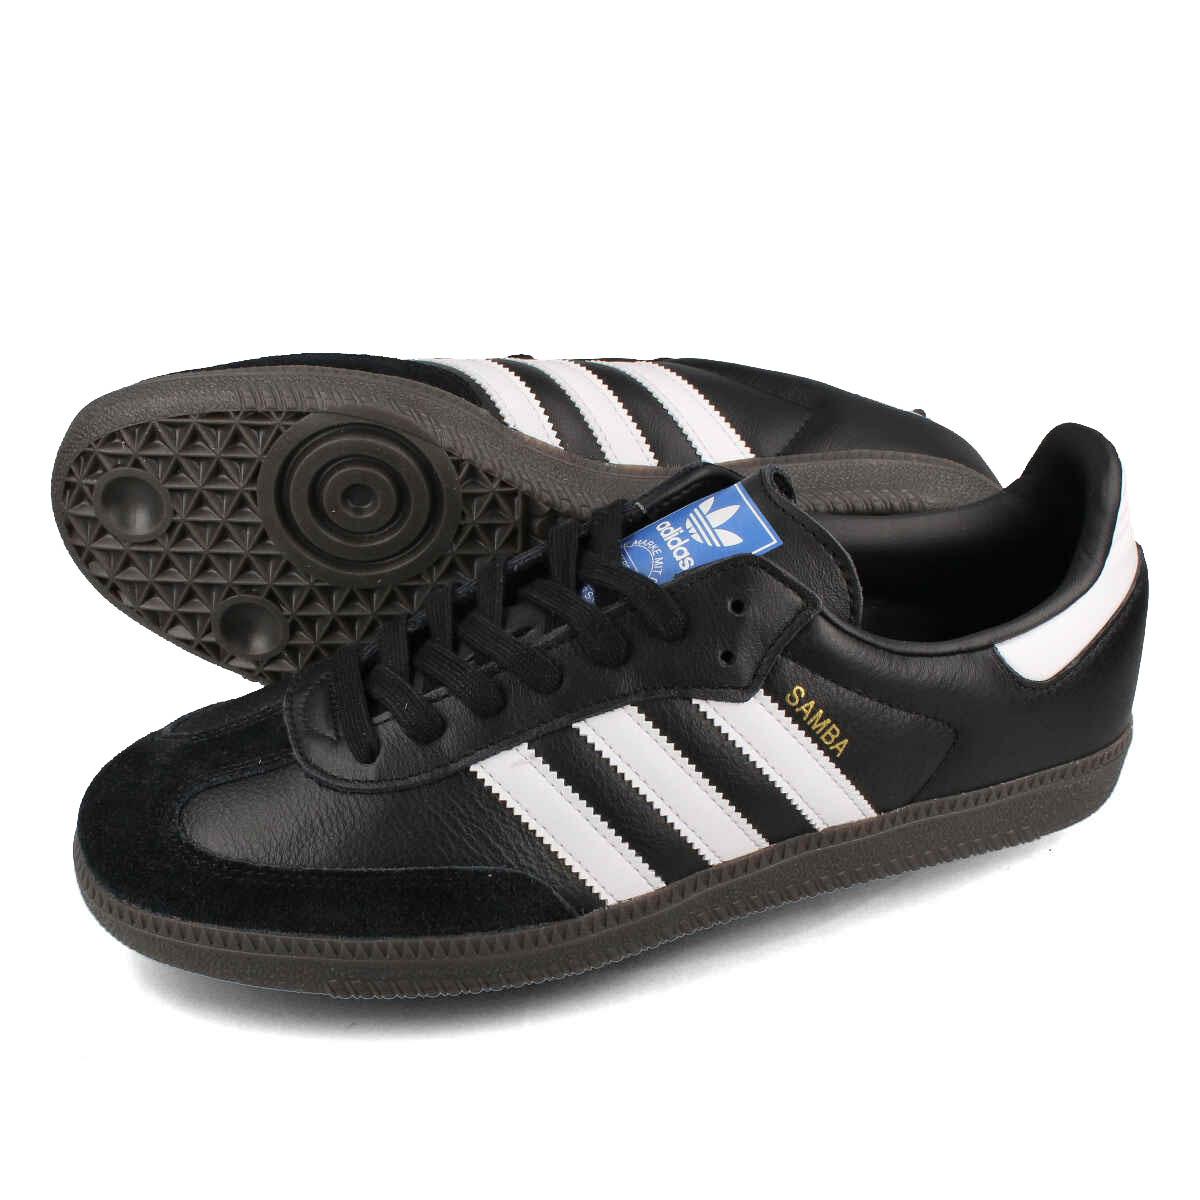 adidas SAMBA OG 【adidas Originals】 アディダス サンバ OG CORE BLACK/RUNNING WHITE/GUM